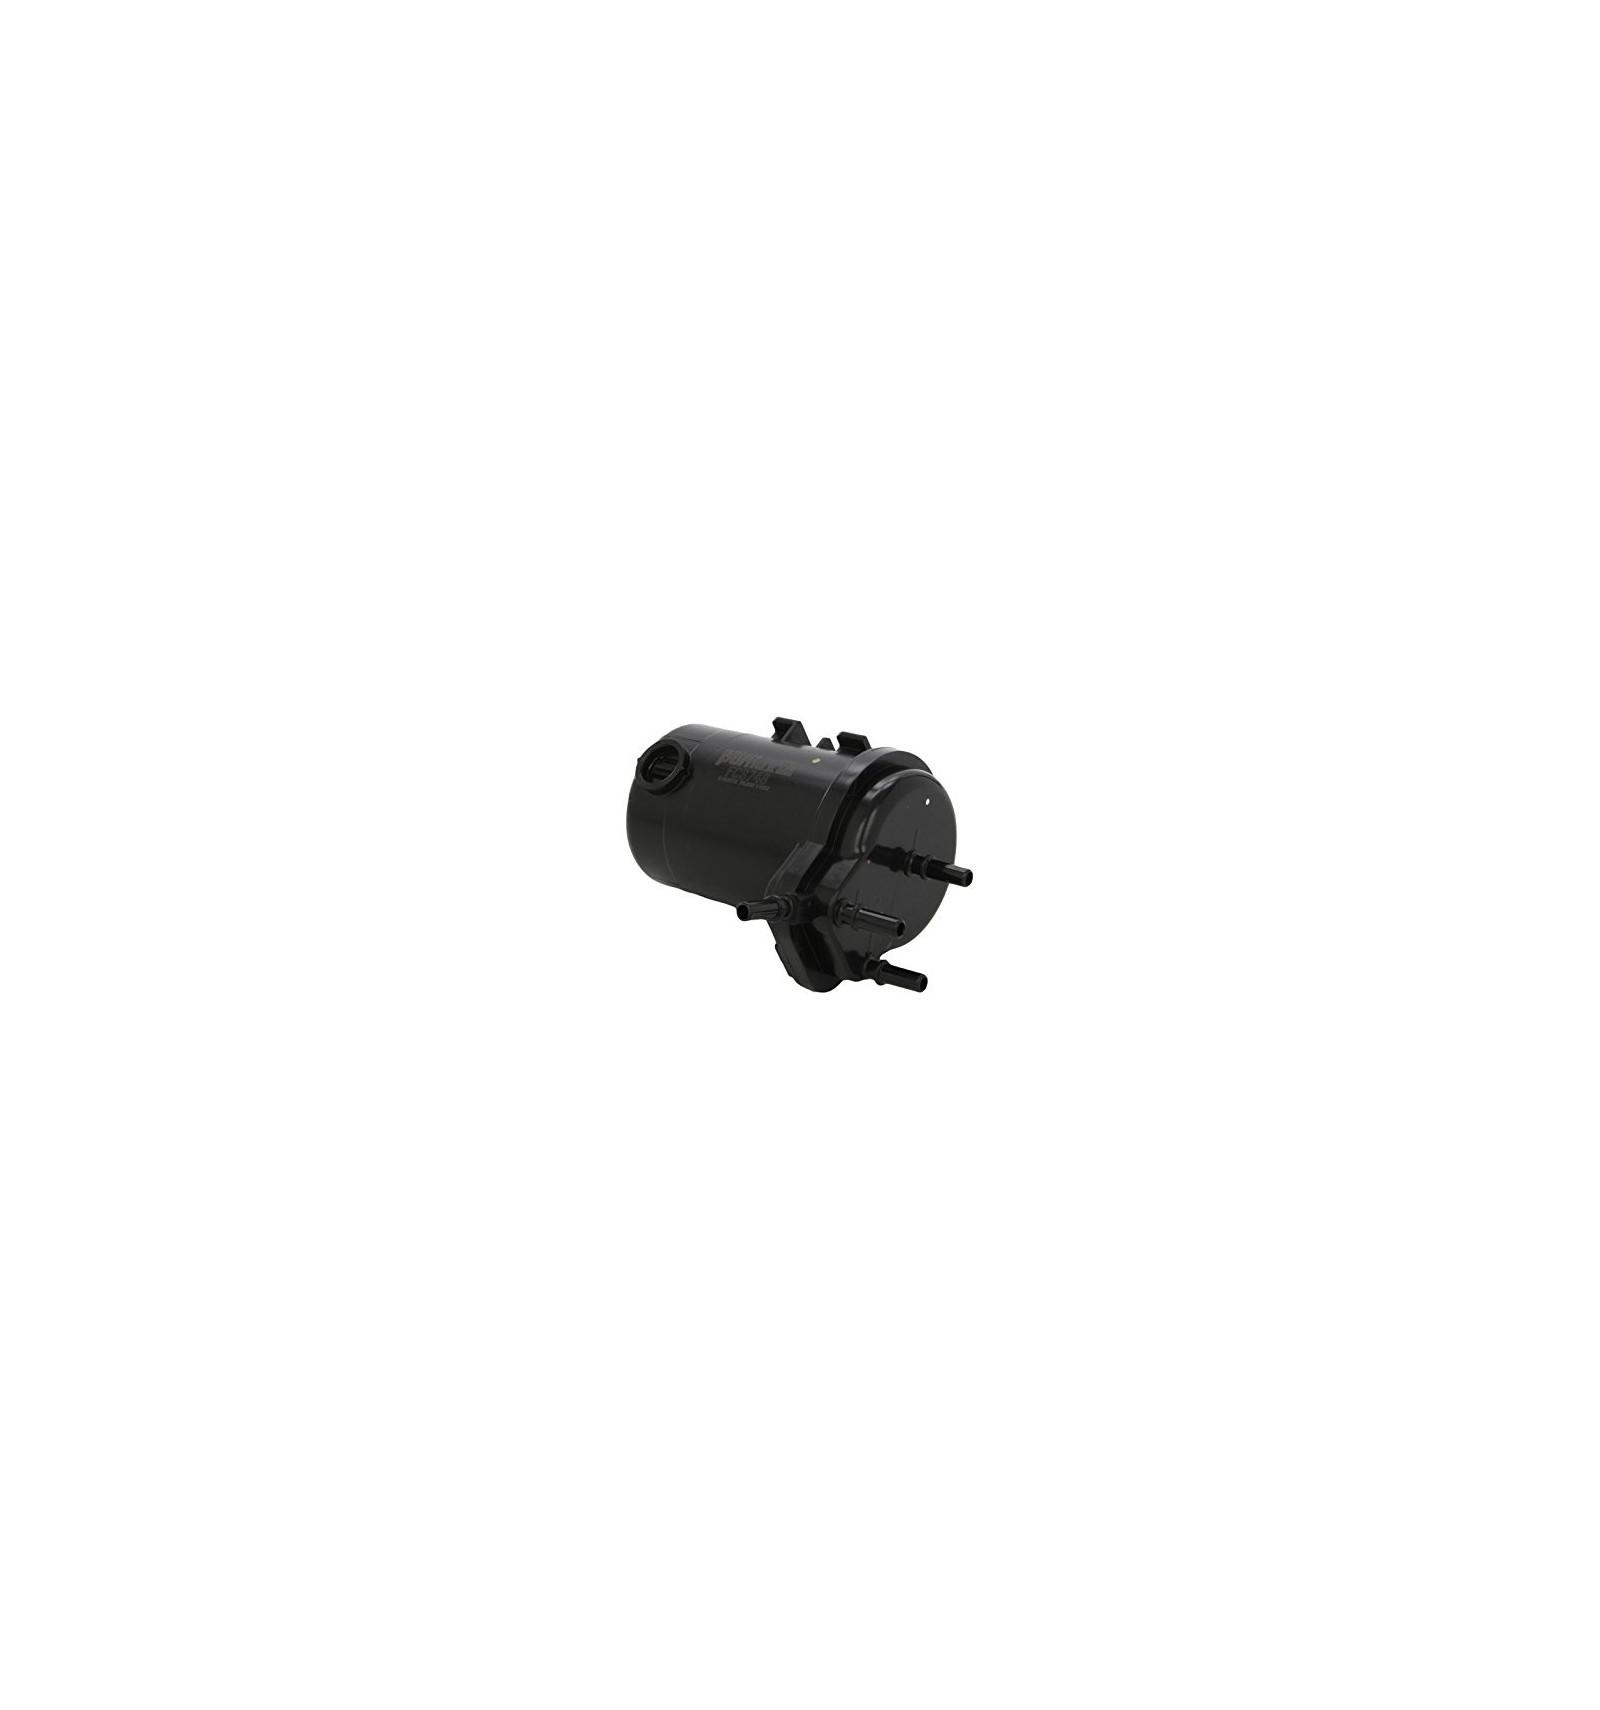 filtration filtre a gasoil renault clio 2 megane 2 kangoo nissan micra 1 5 dci avec capteur d. Black Bedroom Furniture Sets. Home Design Ideas